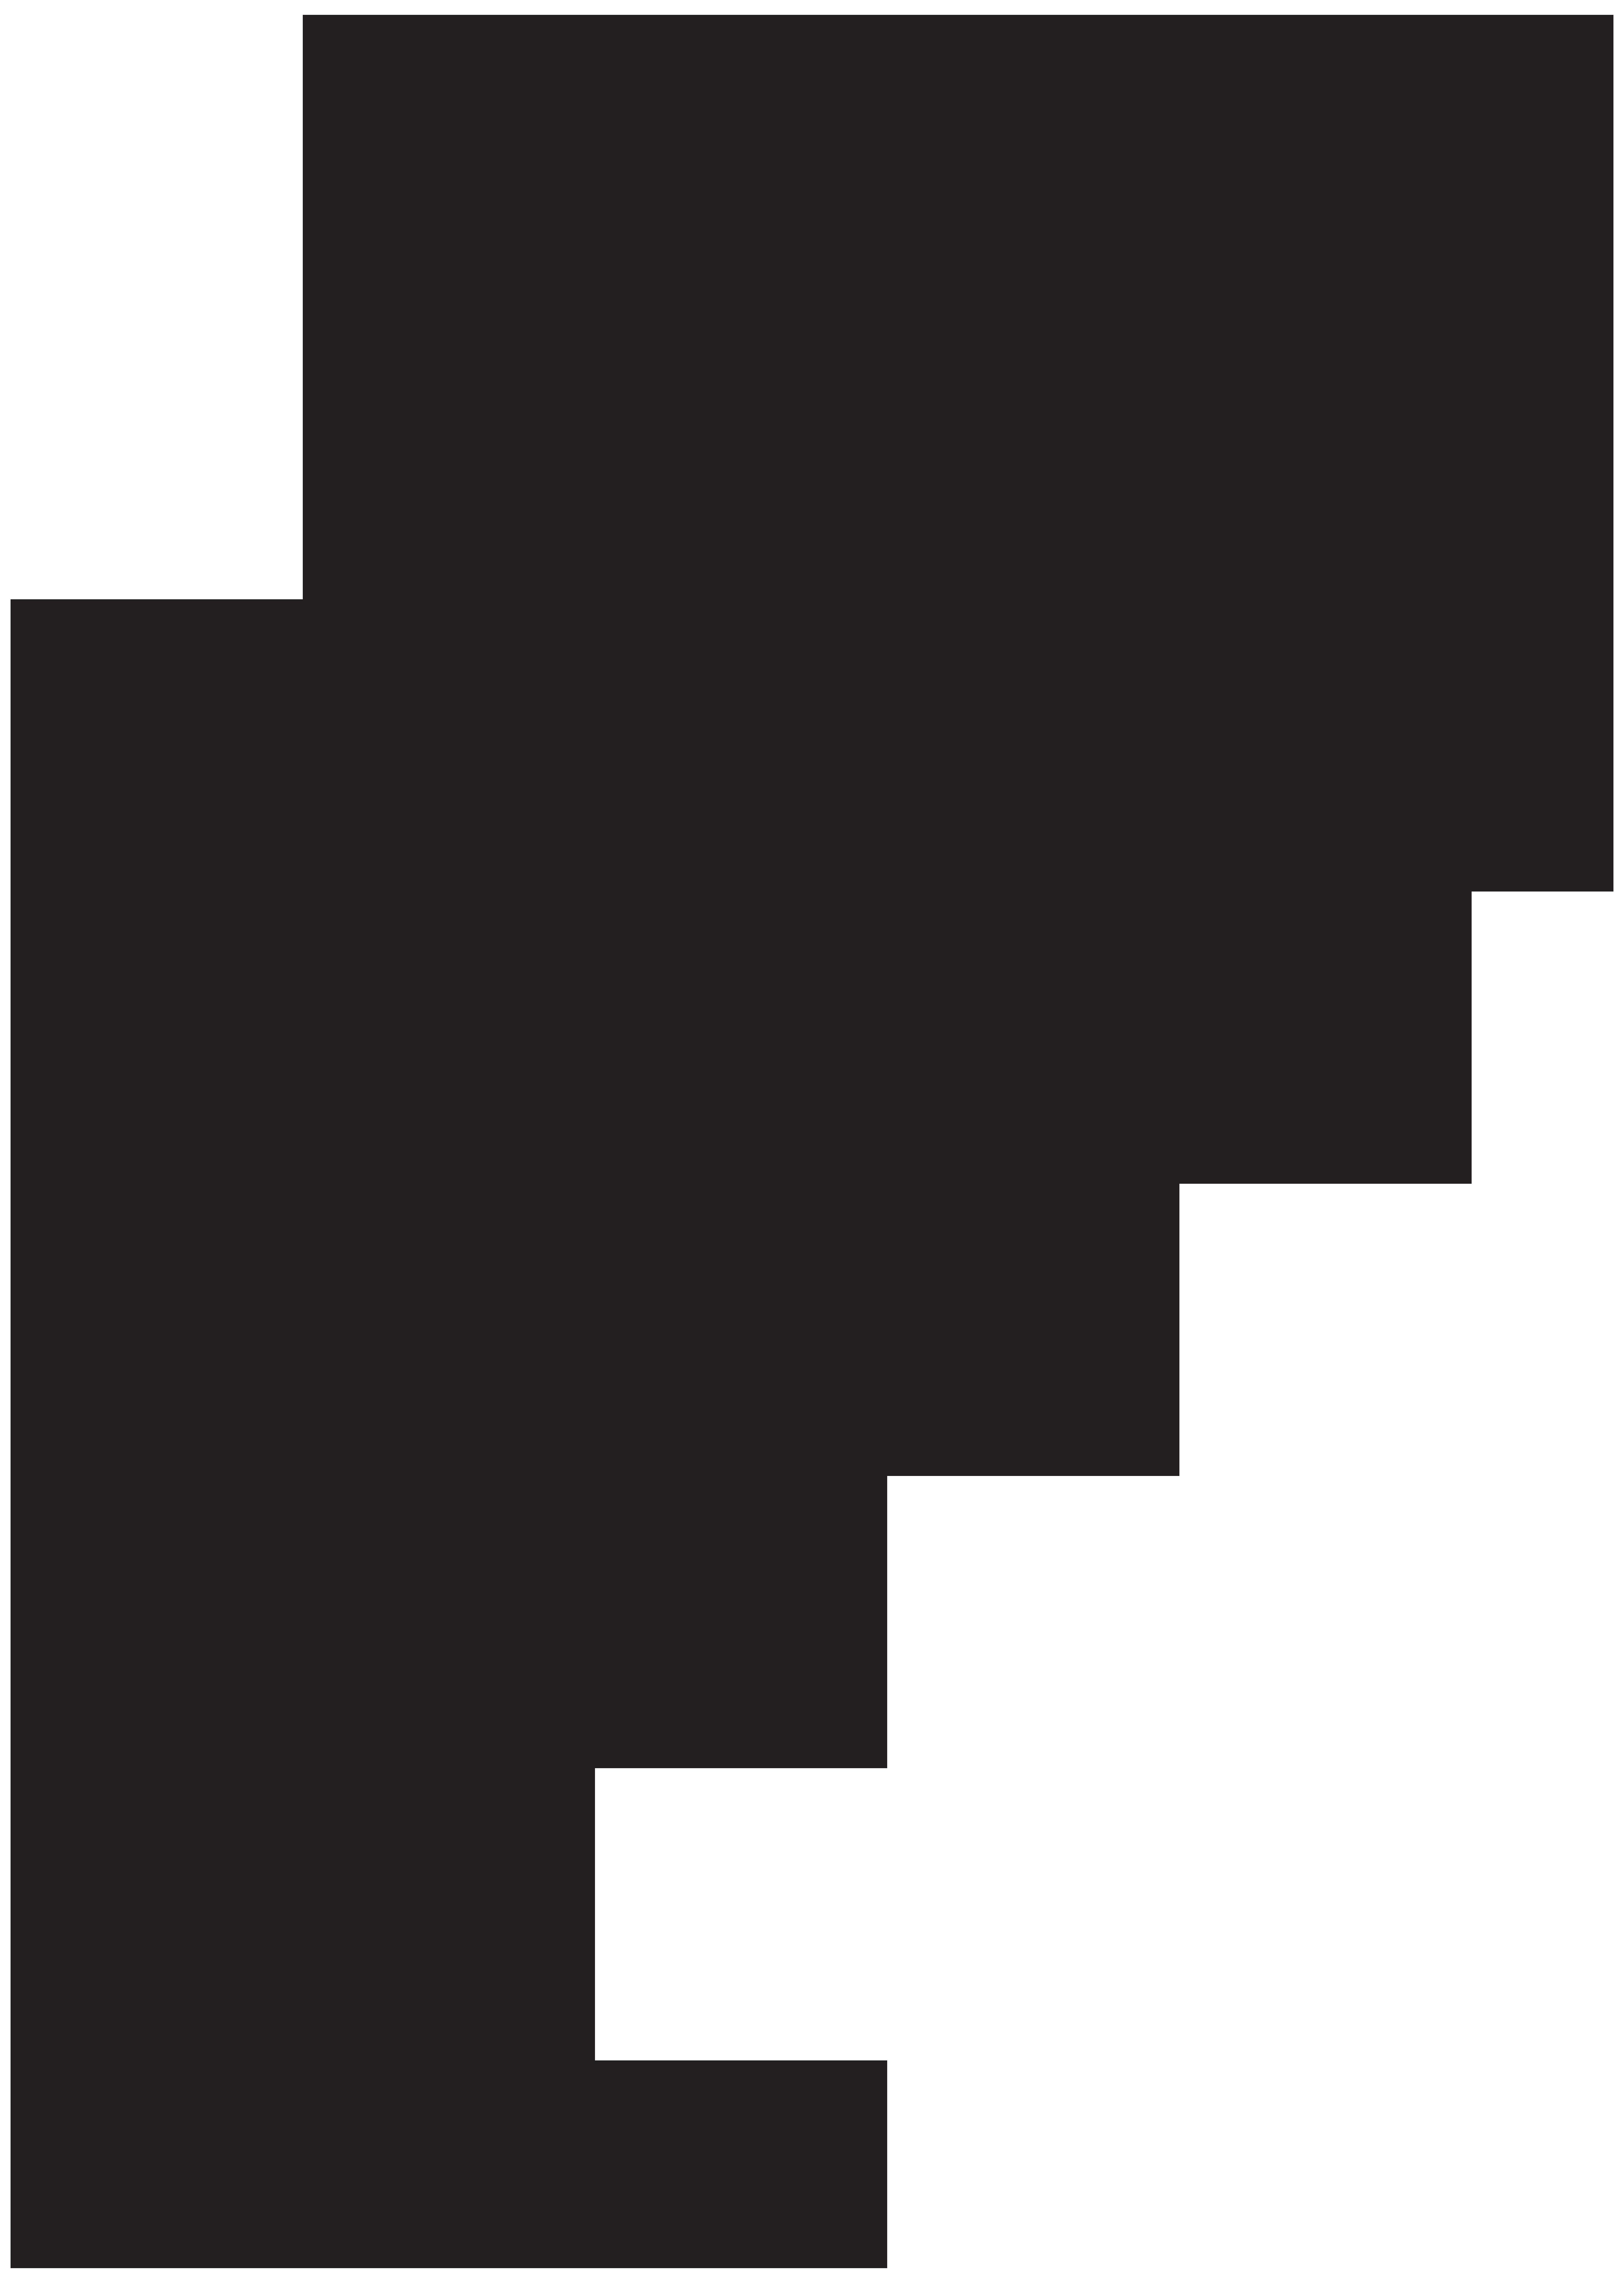 5691x8000 Hockey Player Silhouette Png Clip Art Imageu200b Gallery